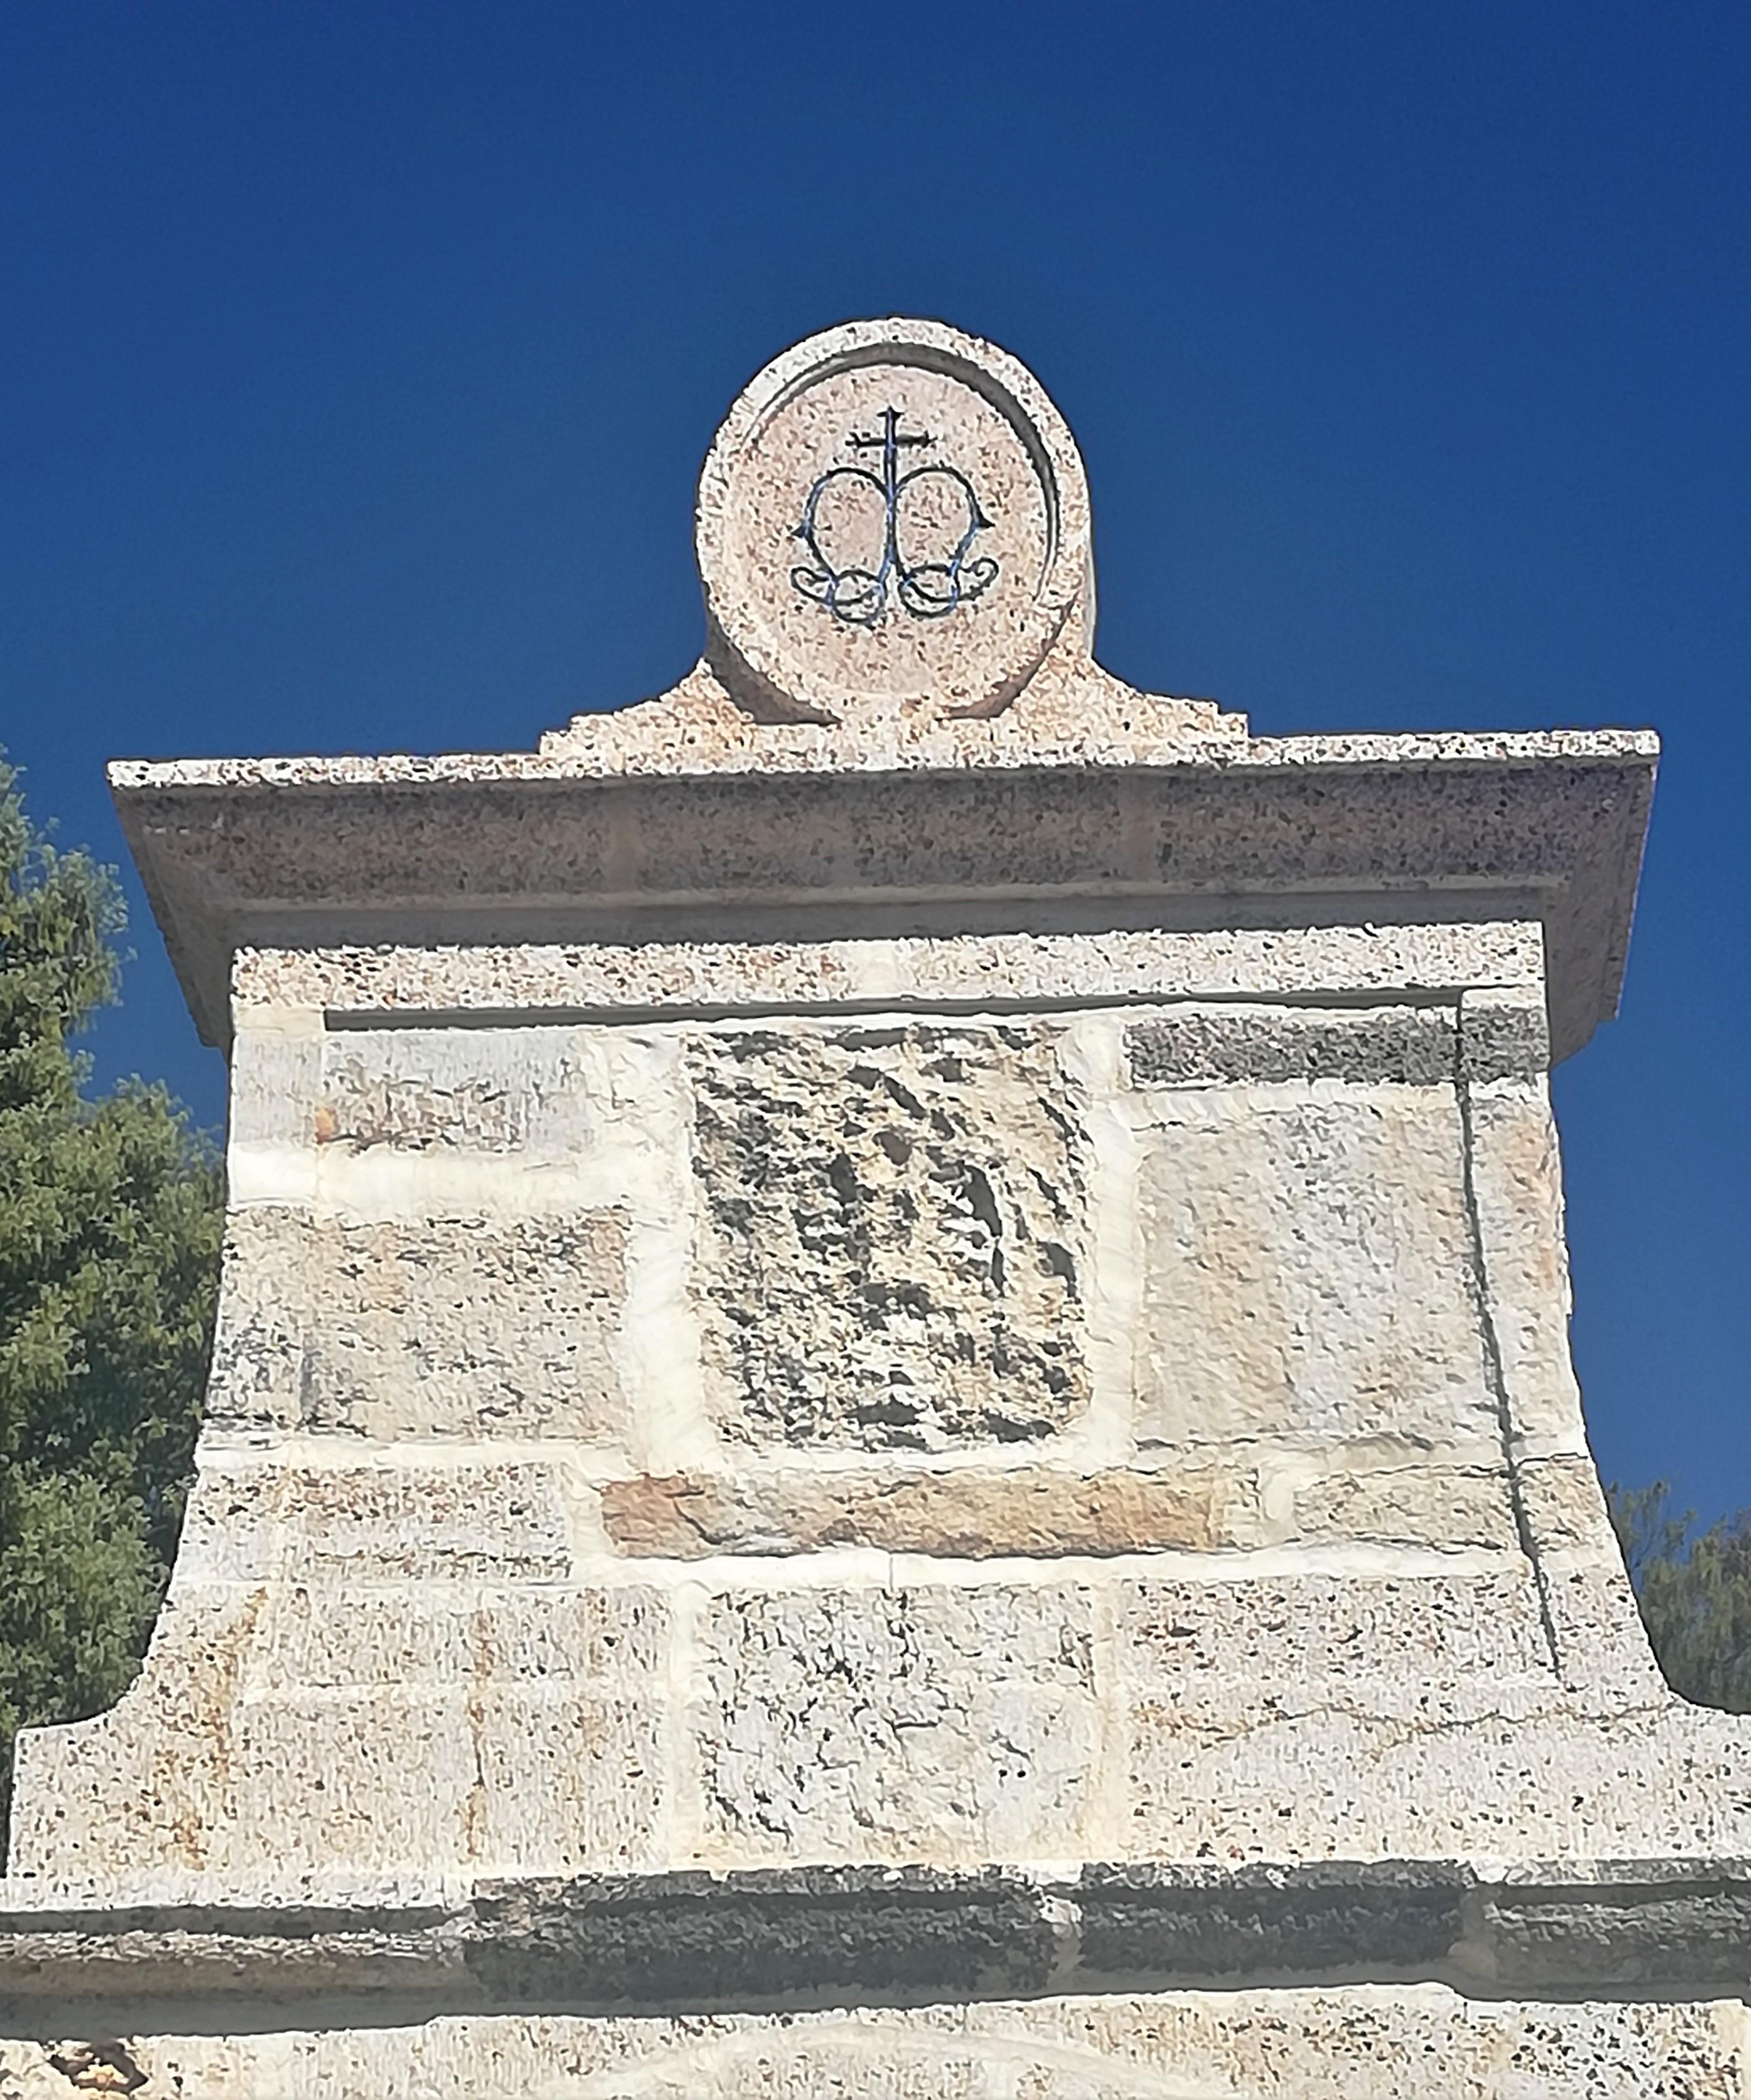 Fuente-talla-piedra-artesania-2- travert